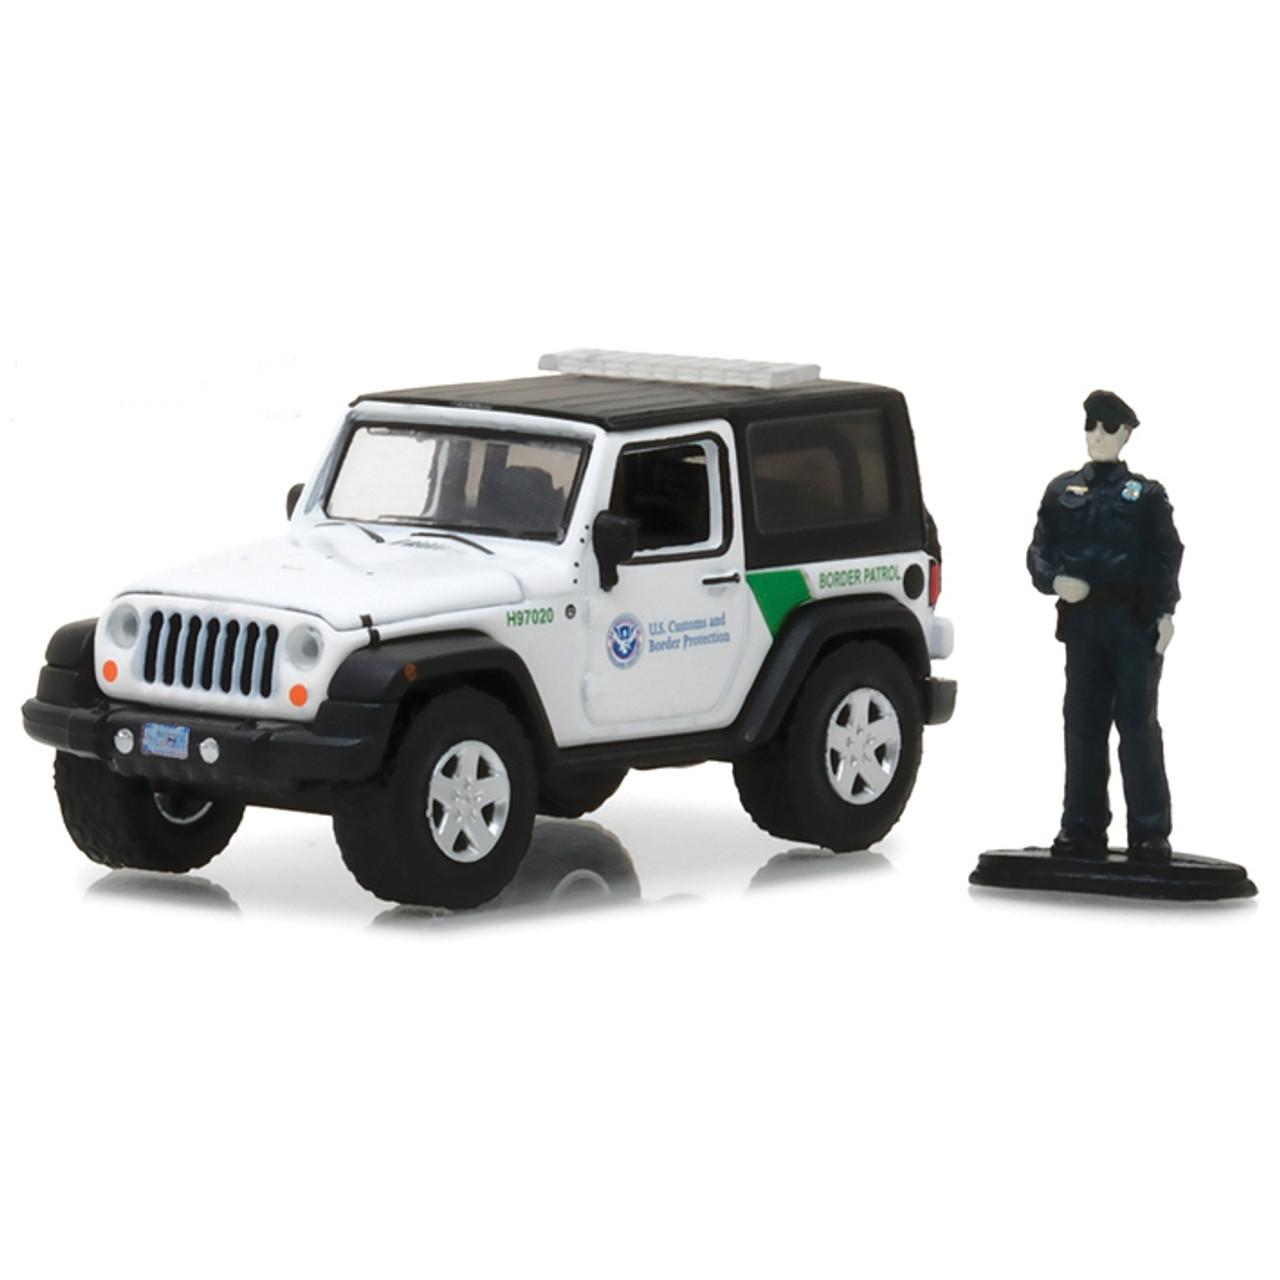 2016 Jeep Wrangler JK Custom Christmas Ornament 1:64 Diecast Border Patrol